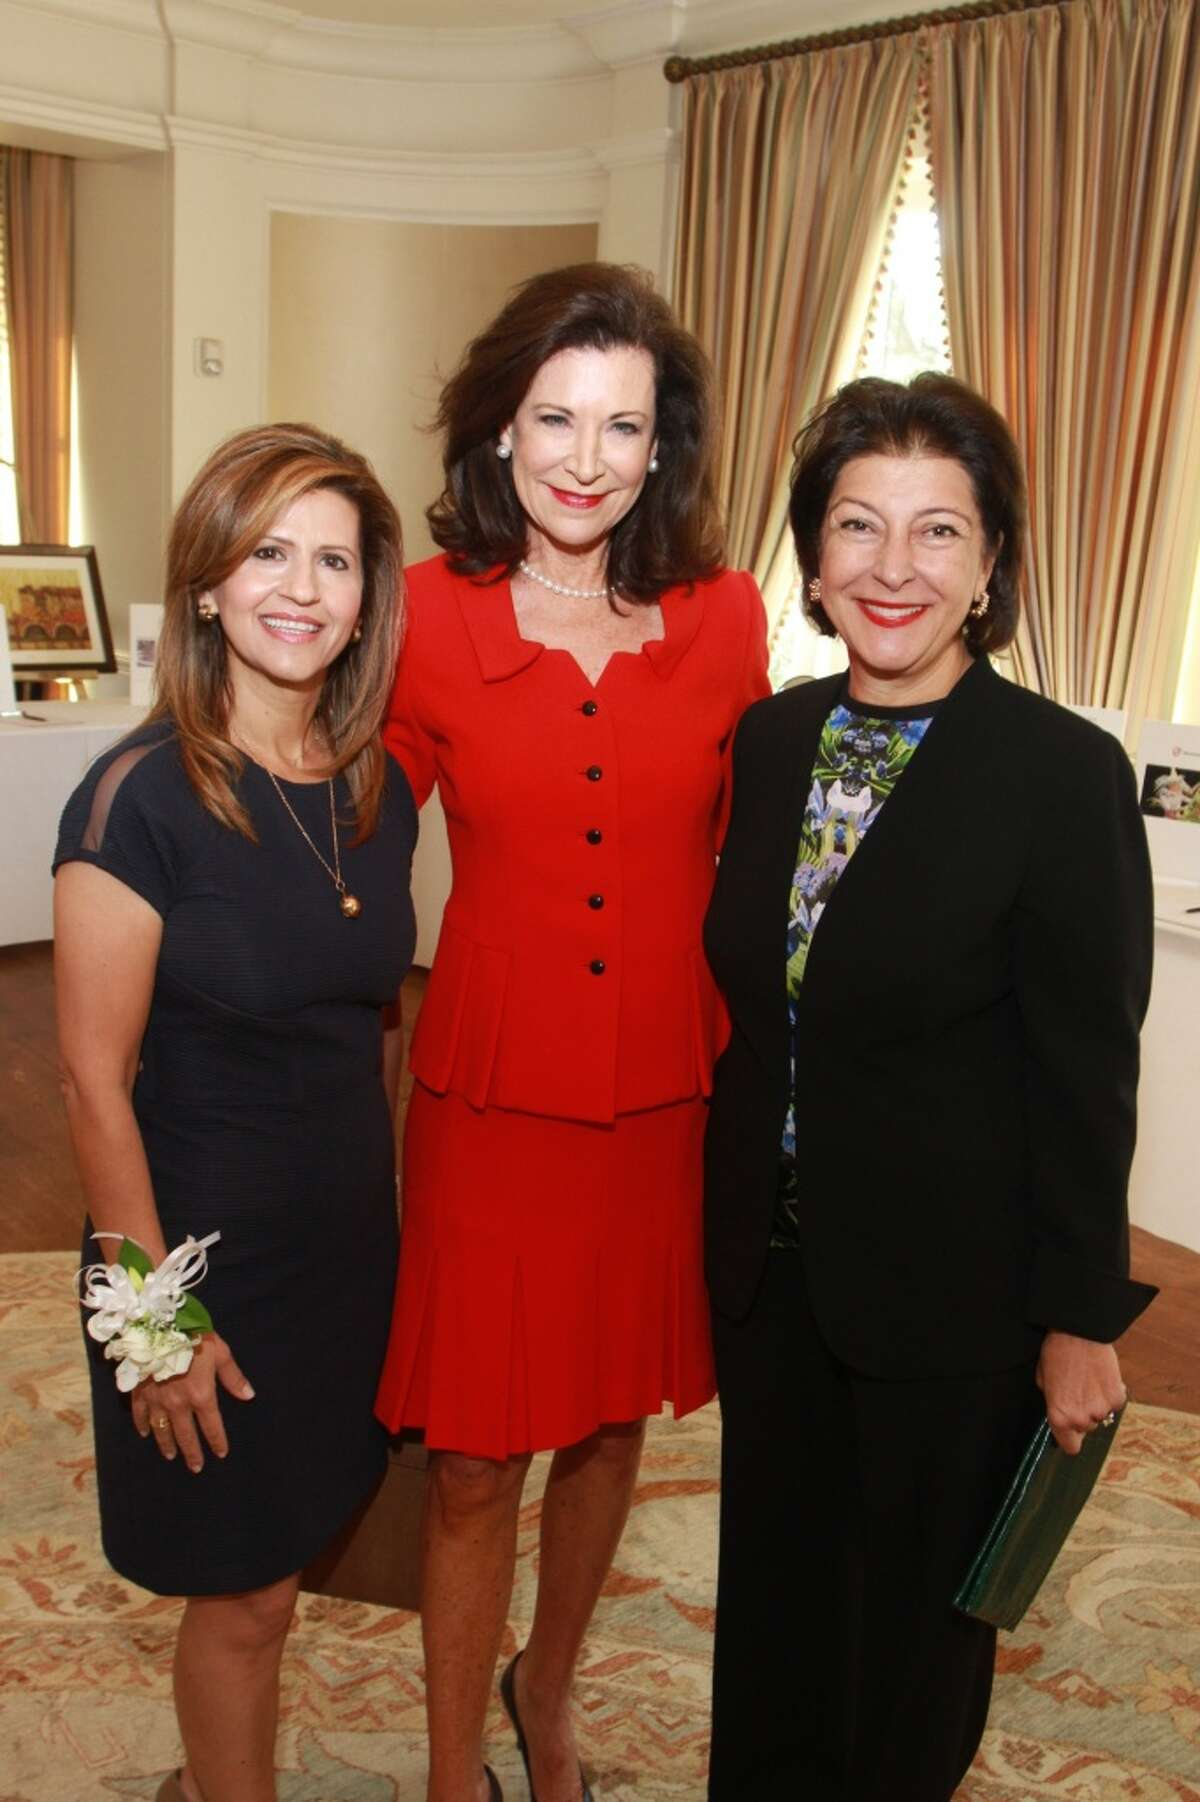 Mehrnaz Gill, from left, Betty Hrncir and Jaleh Sallee